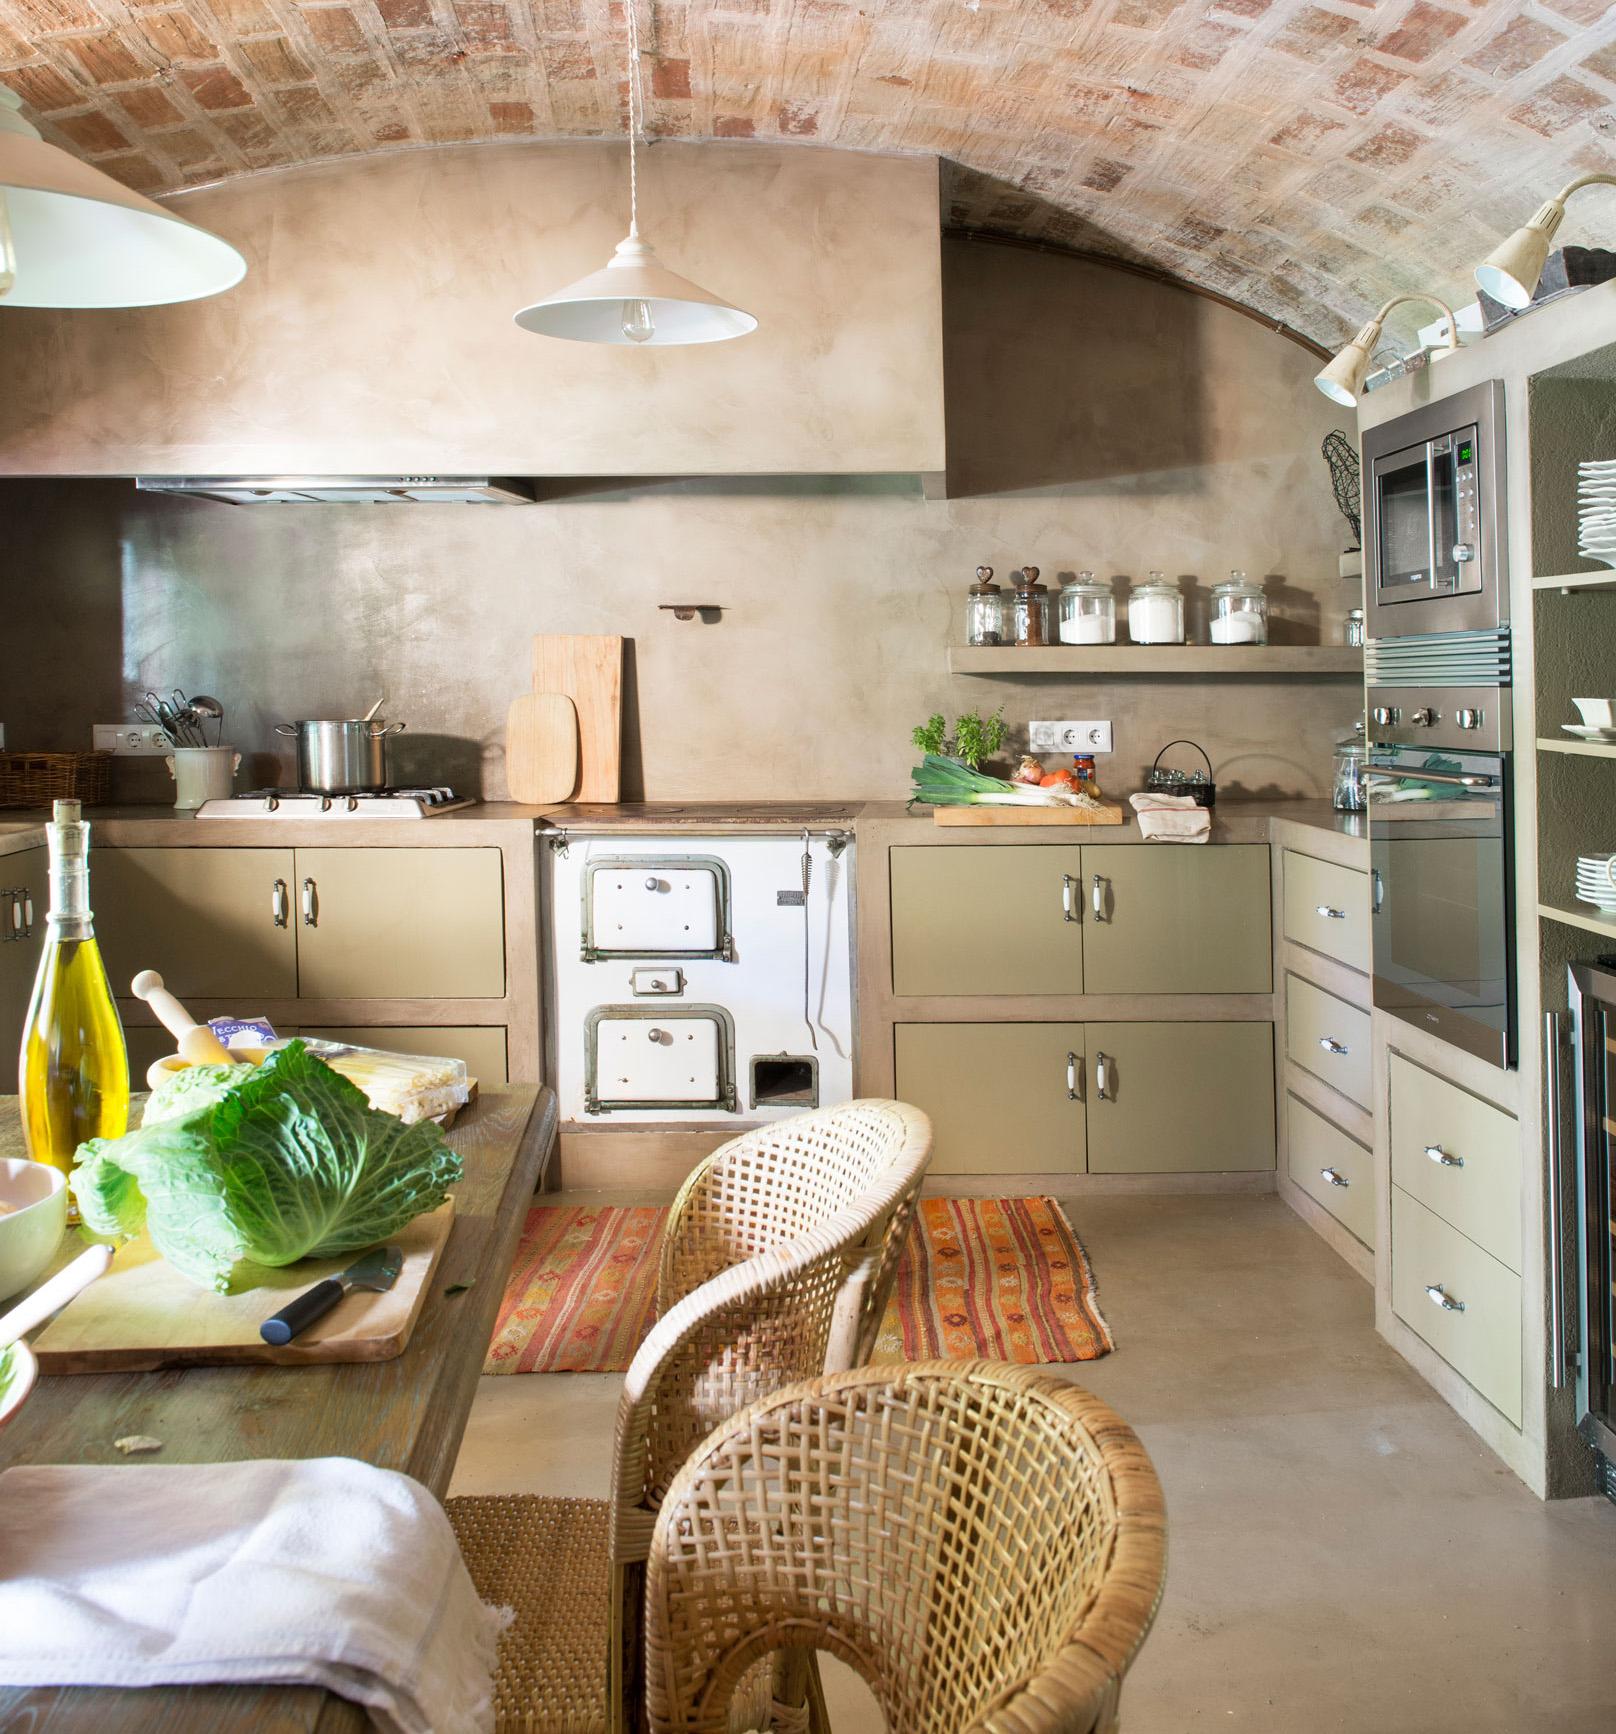 Bonito Cocina Fotos De Salpique Cristal Patrón - Ideas de Decoración ...